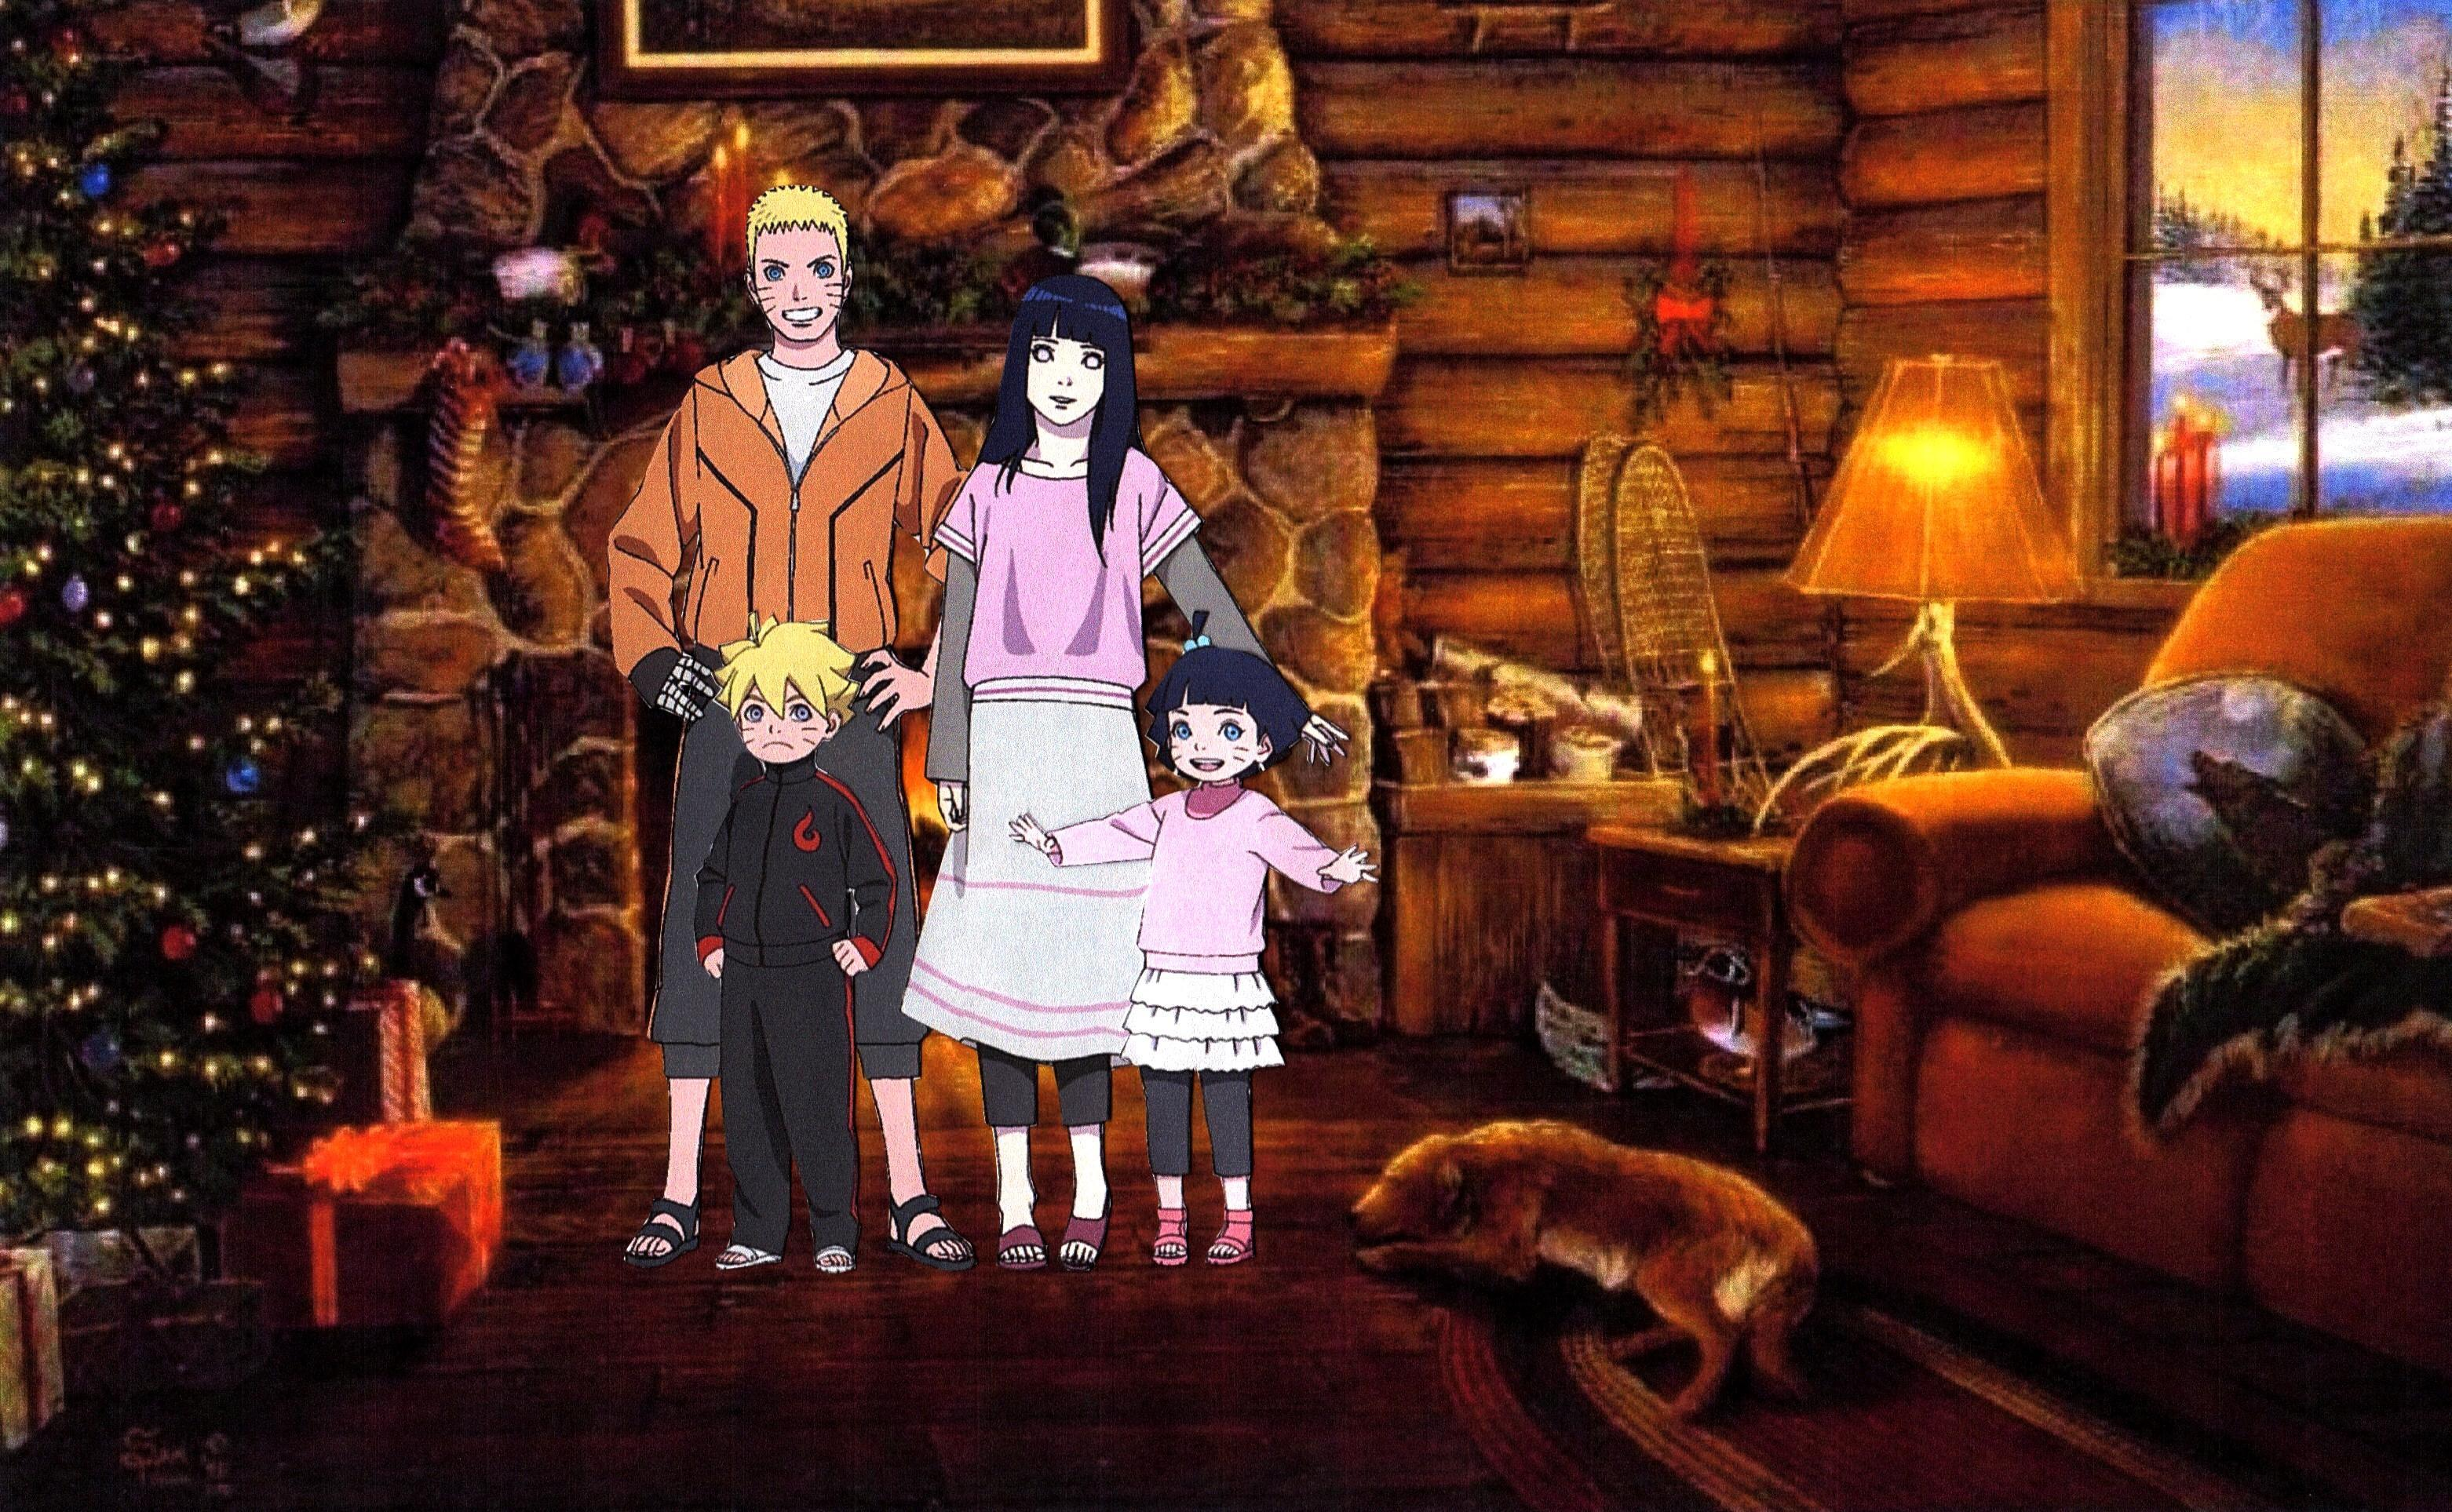 Beautiful Wallpaper Halloween Naruto - naruto_hinata_boruto_himawari_wallpaper_3_by_weissdrum-d863wea  2018_553751.jpg